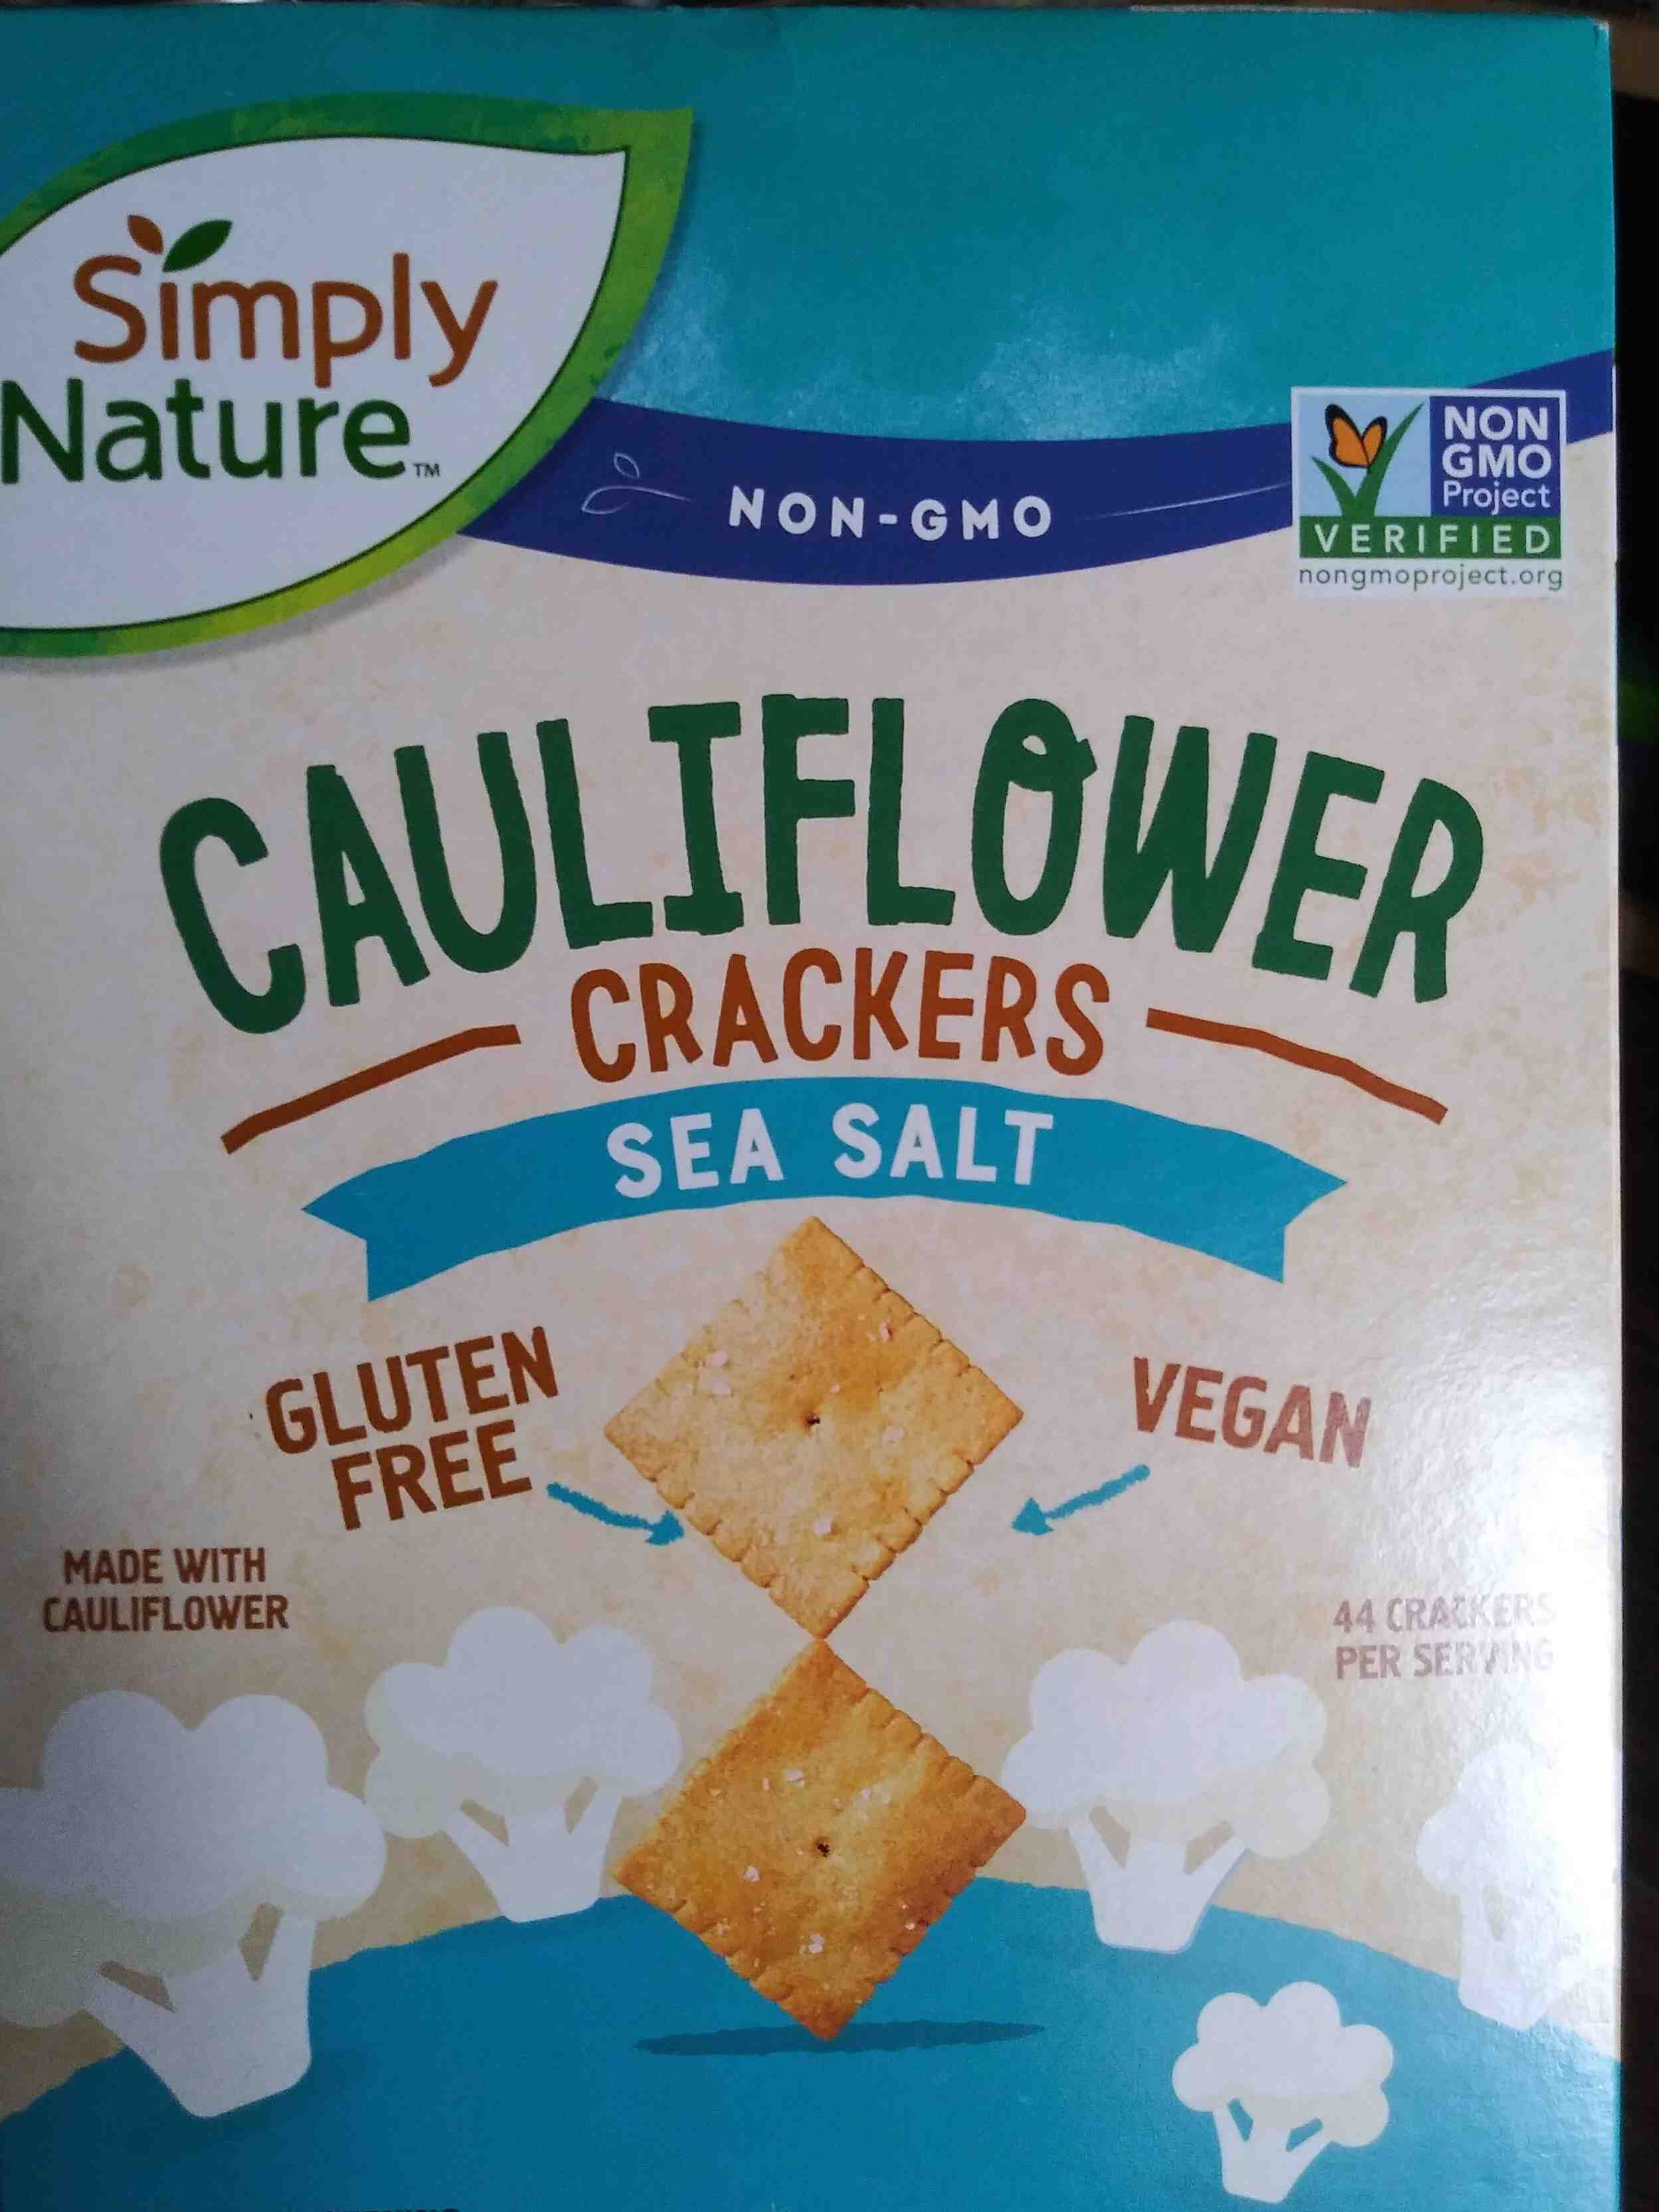 Simply Nature Cauliflower crackers (sea salt) - Product - en